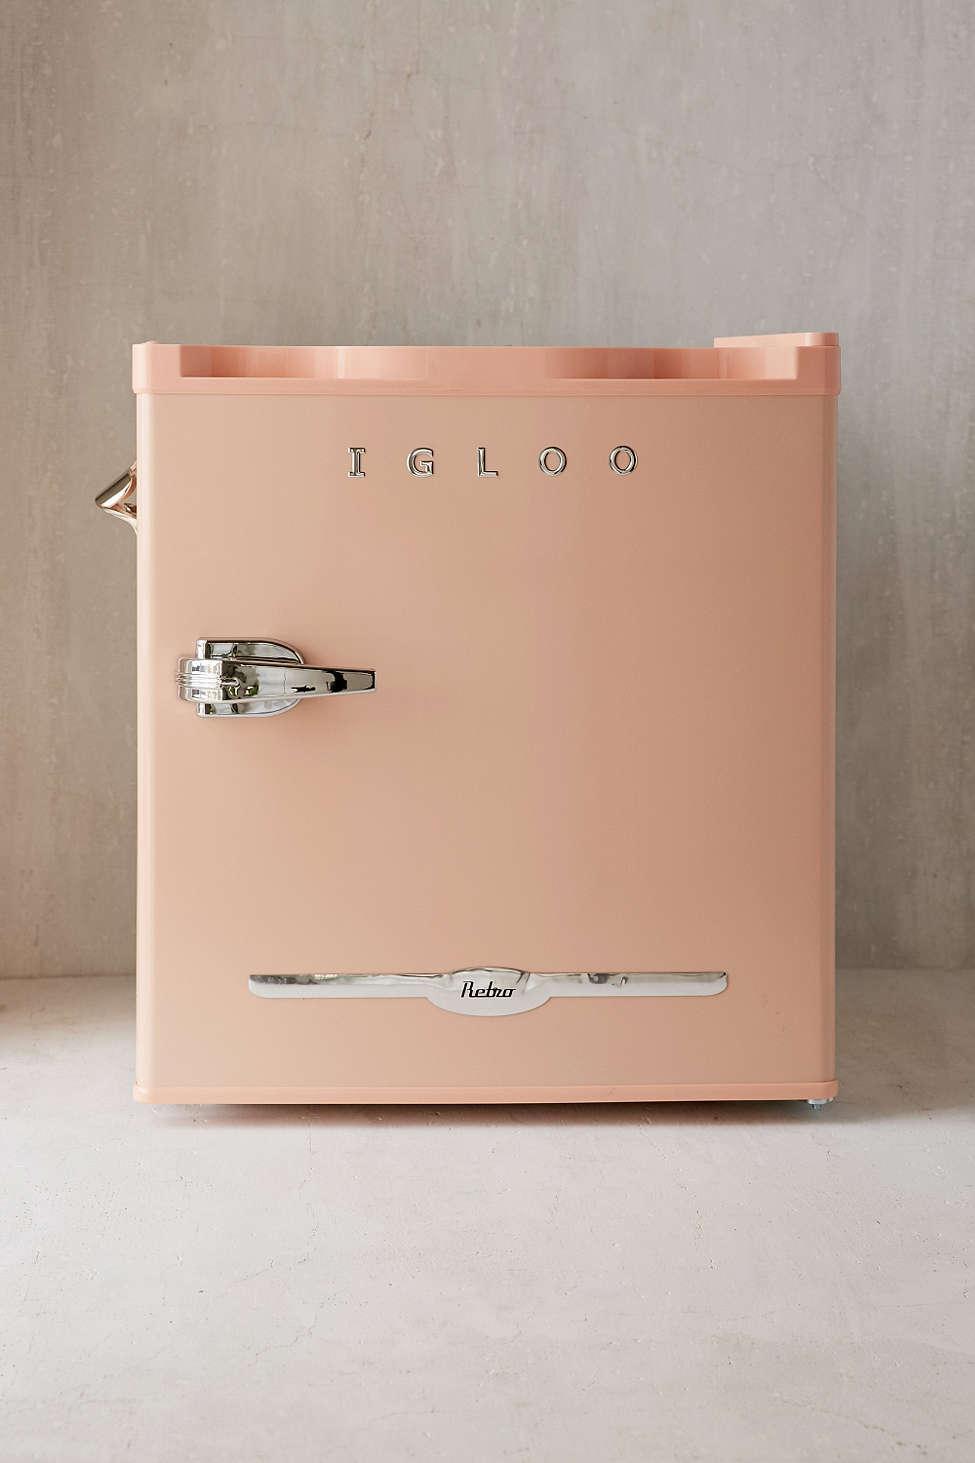 Mini Fridge for your Bedroom